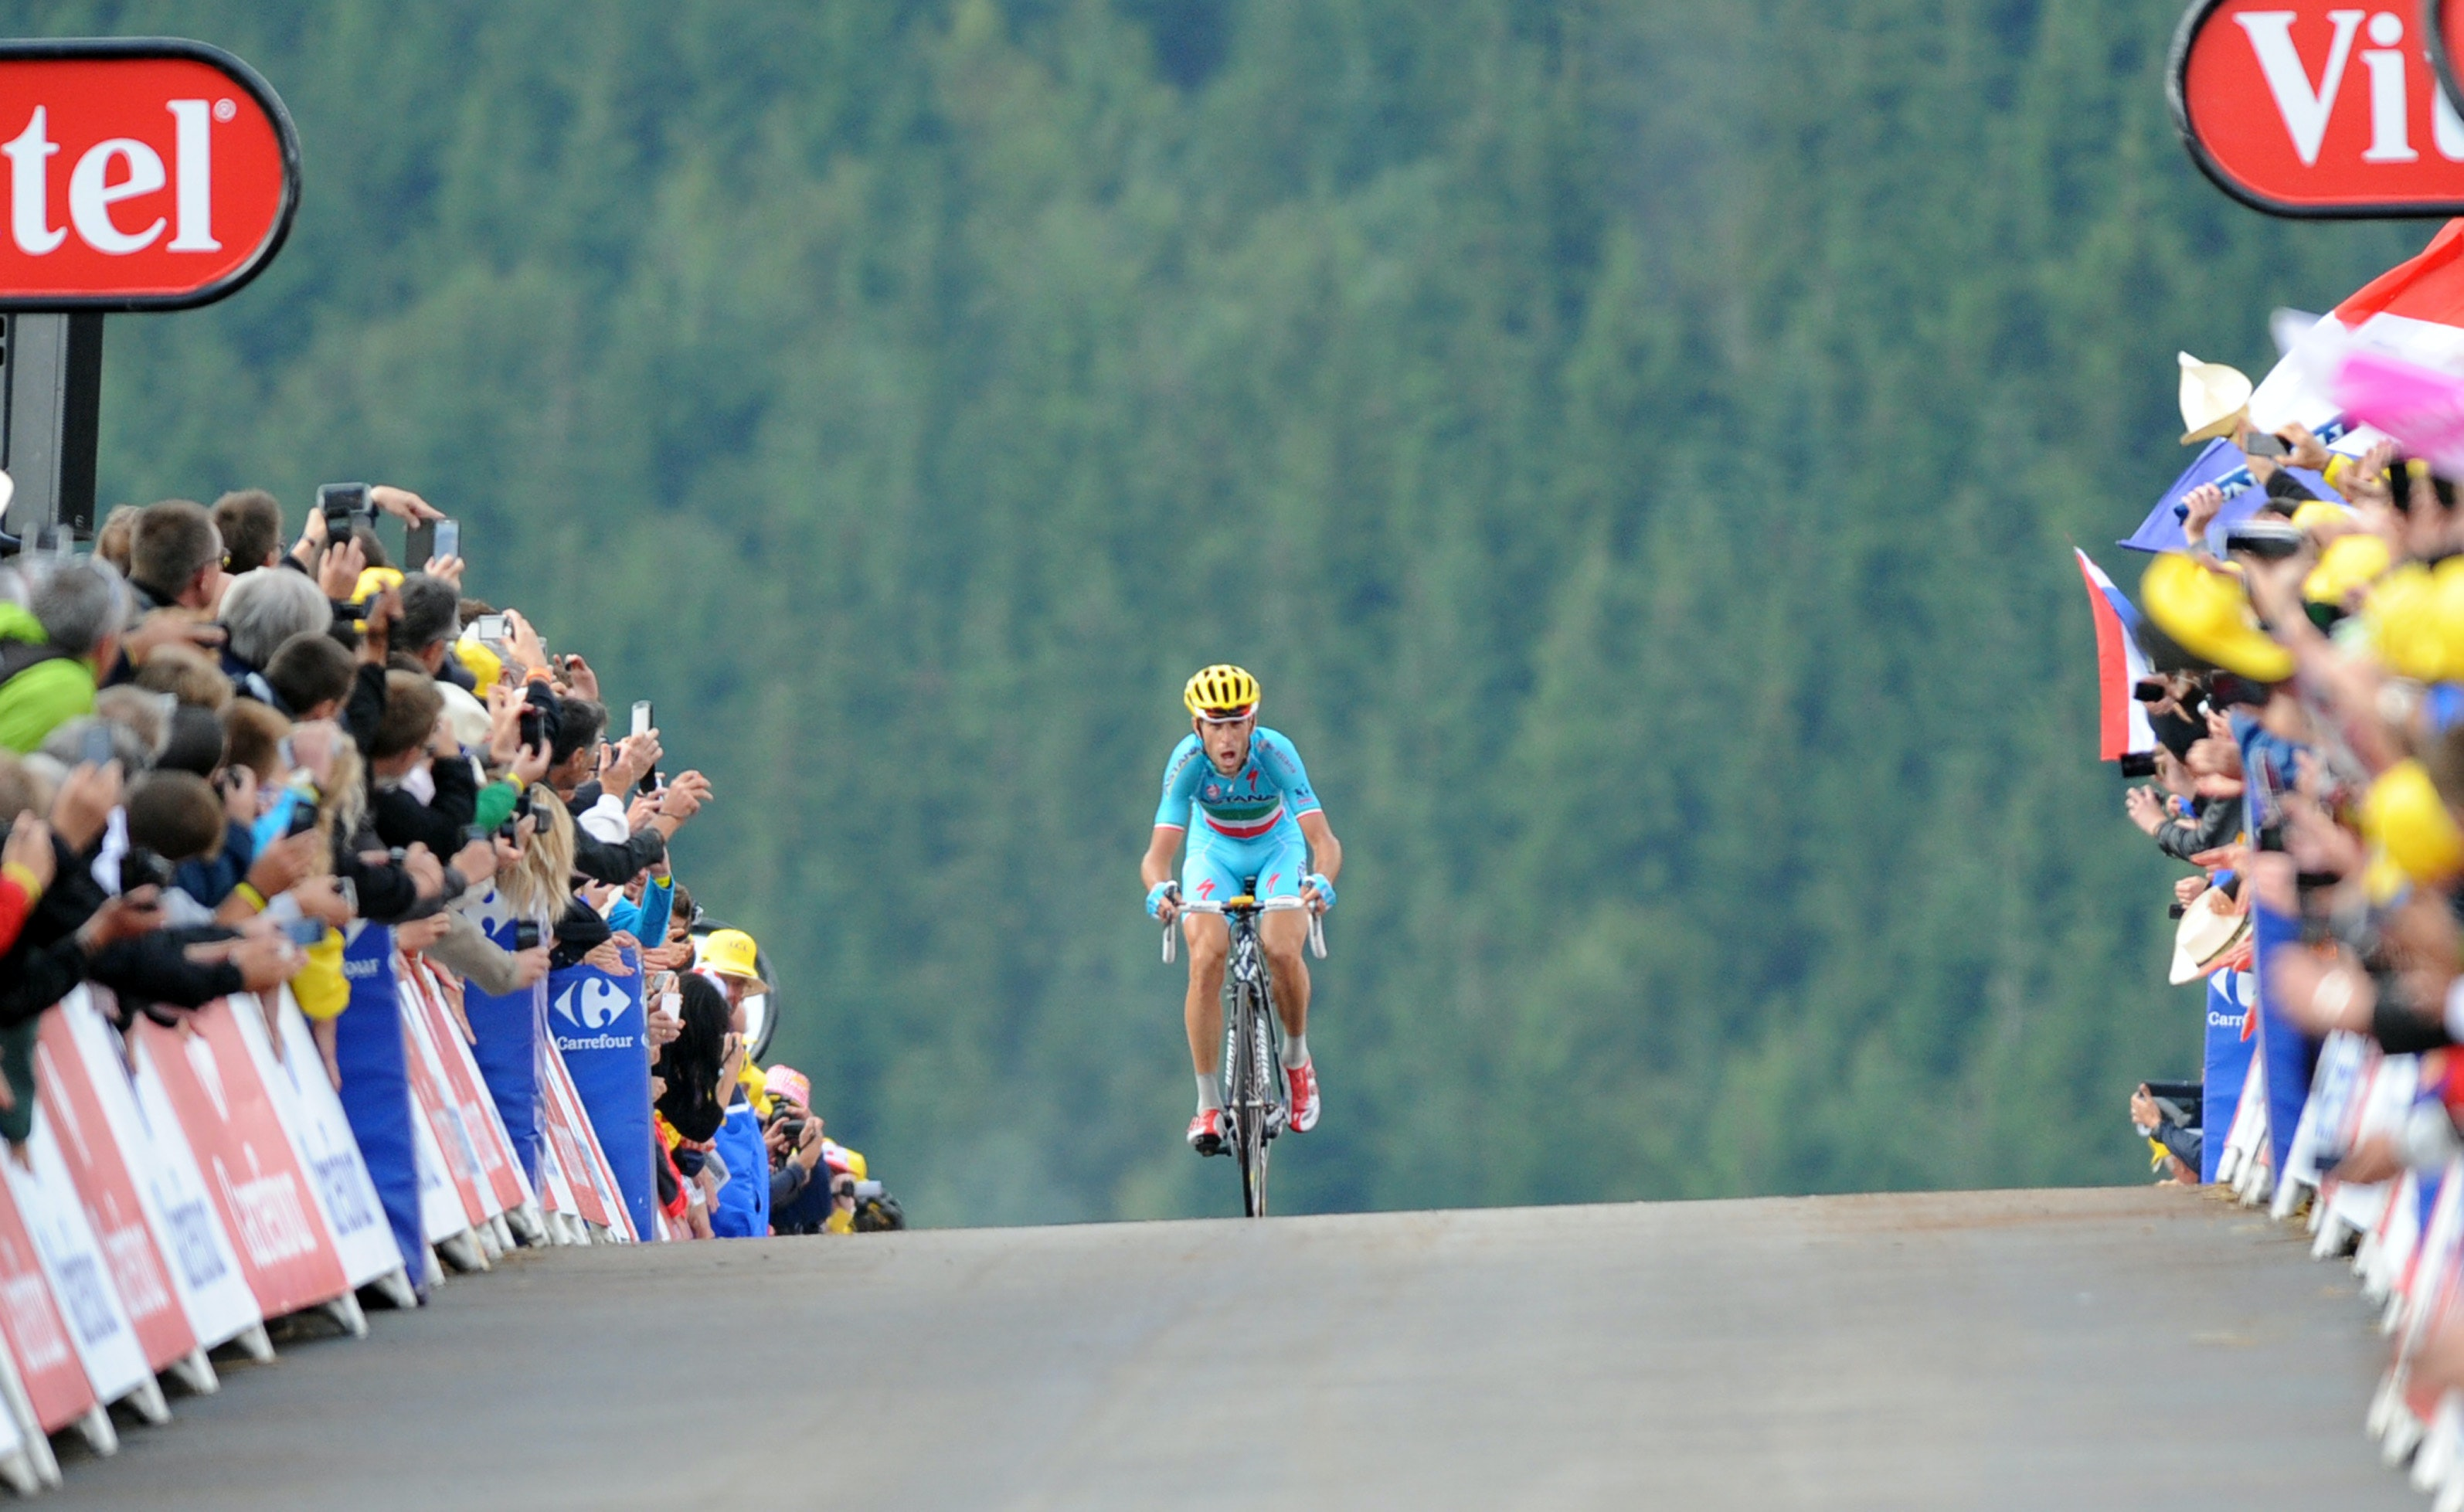 Vincenzo Nibali, Astana, Tour de France, 2014, stage ten, pic: Sirotti